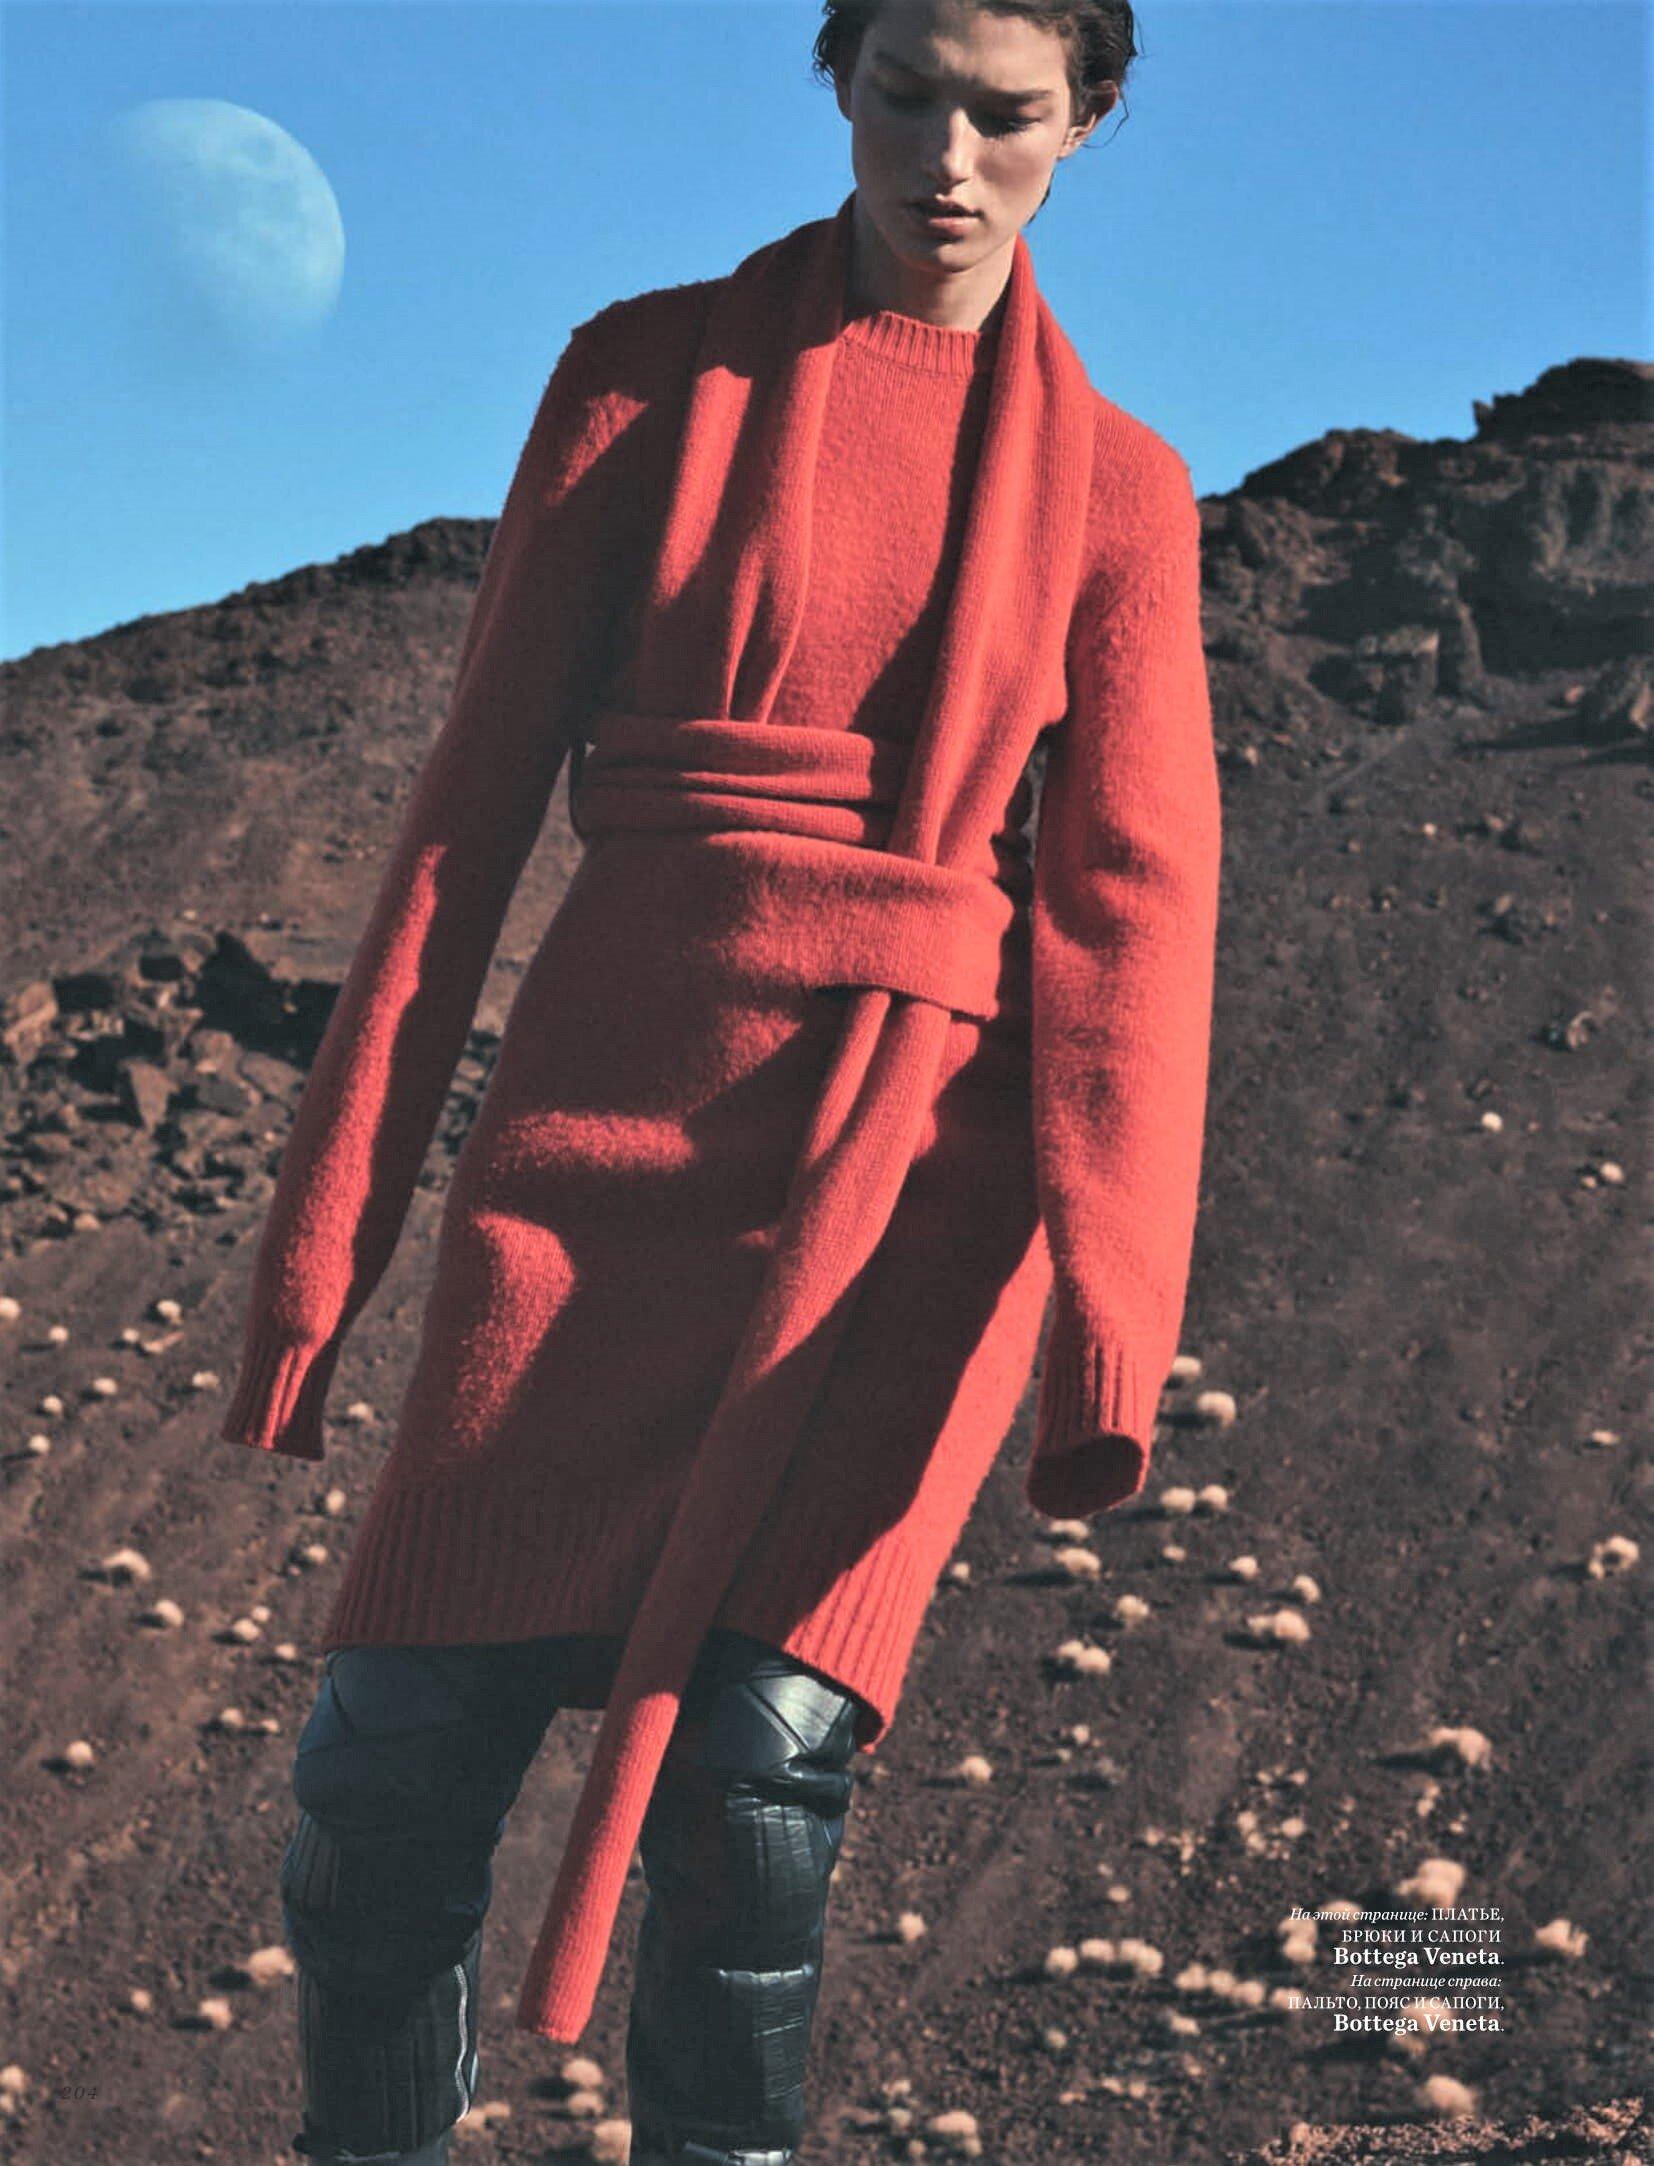 McKenna Hellan by Stefano Galuzzi for Harper's Bazaar Russia November 2019  (2).jpg